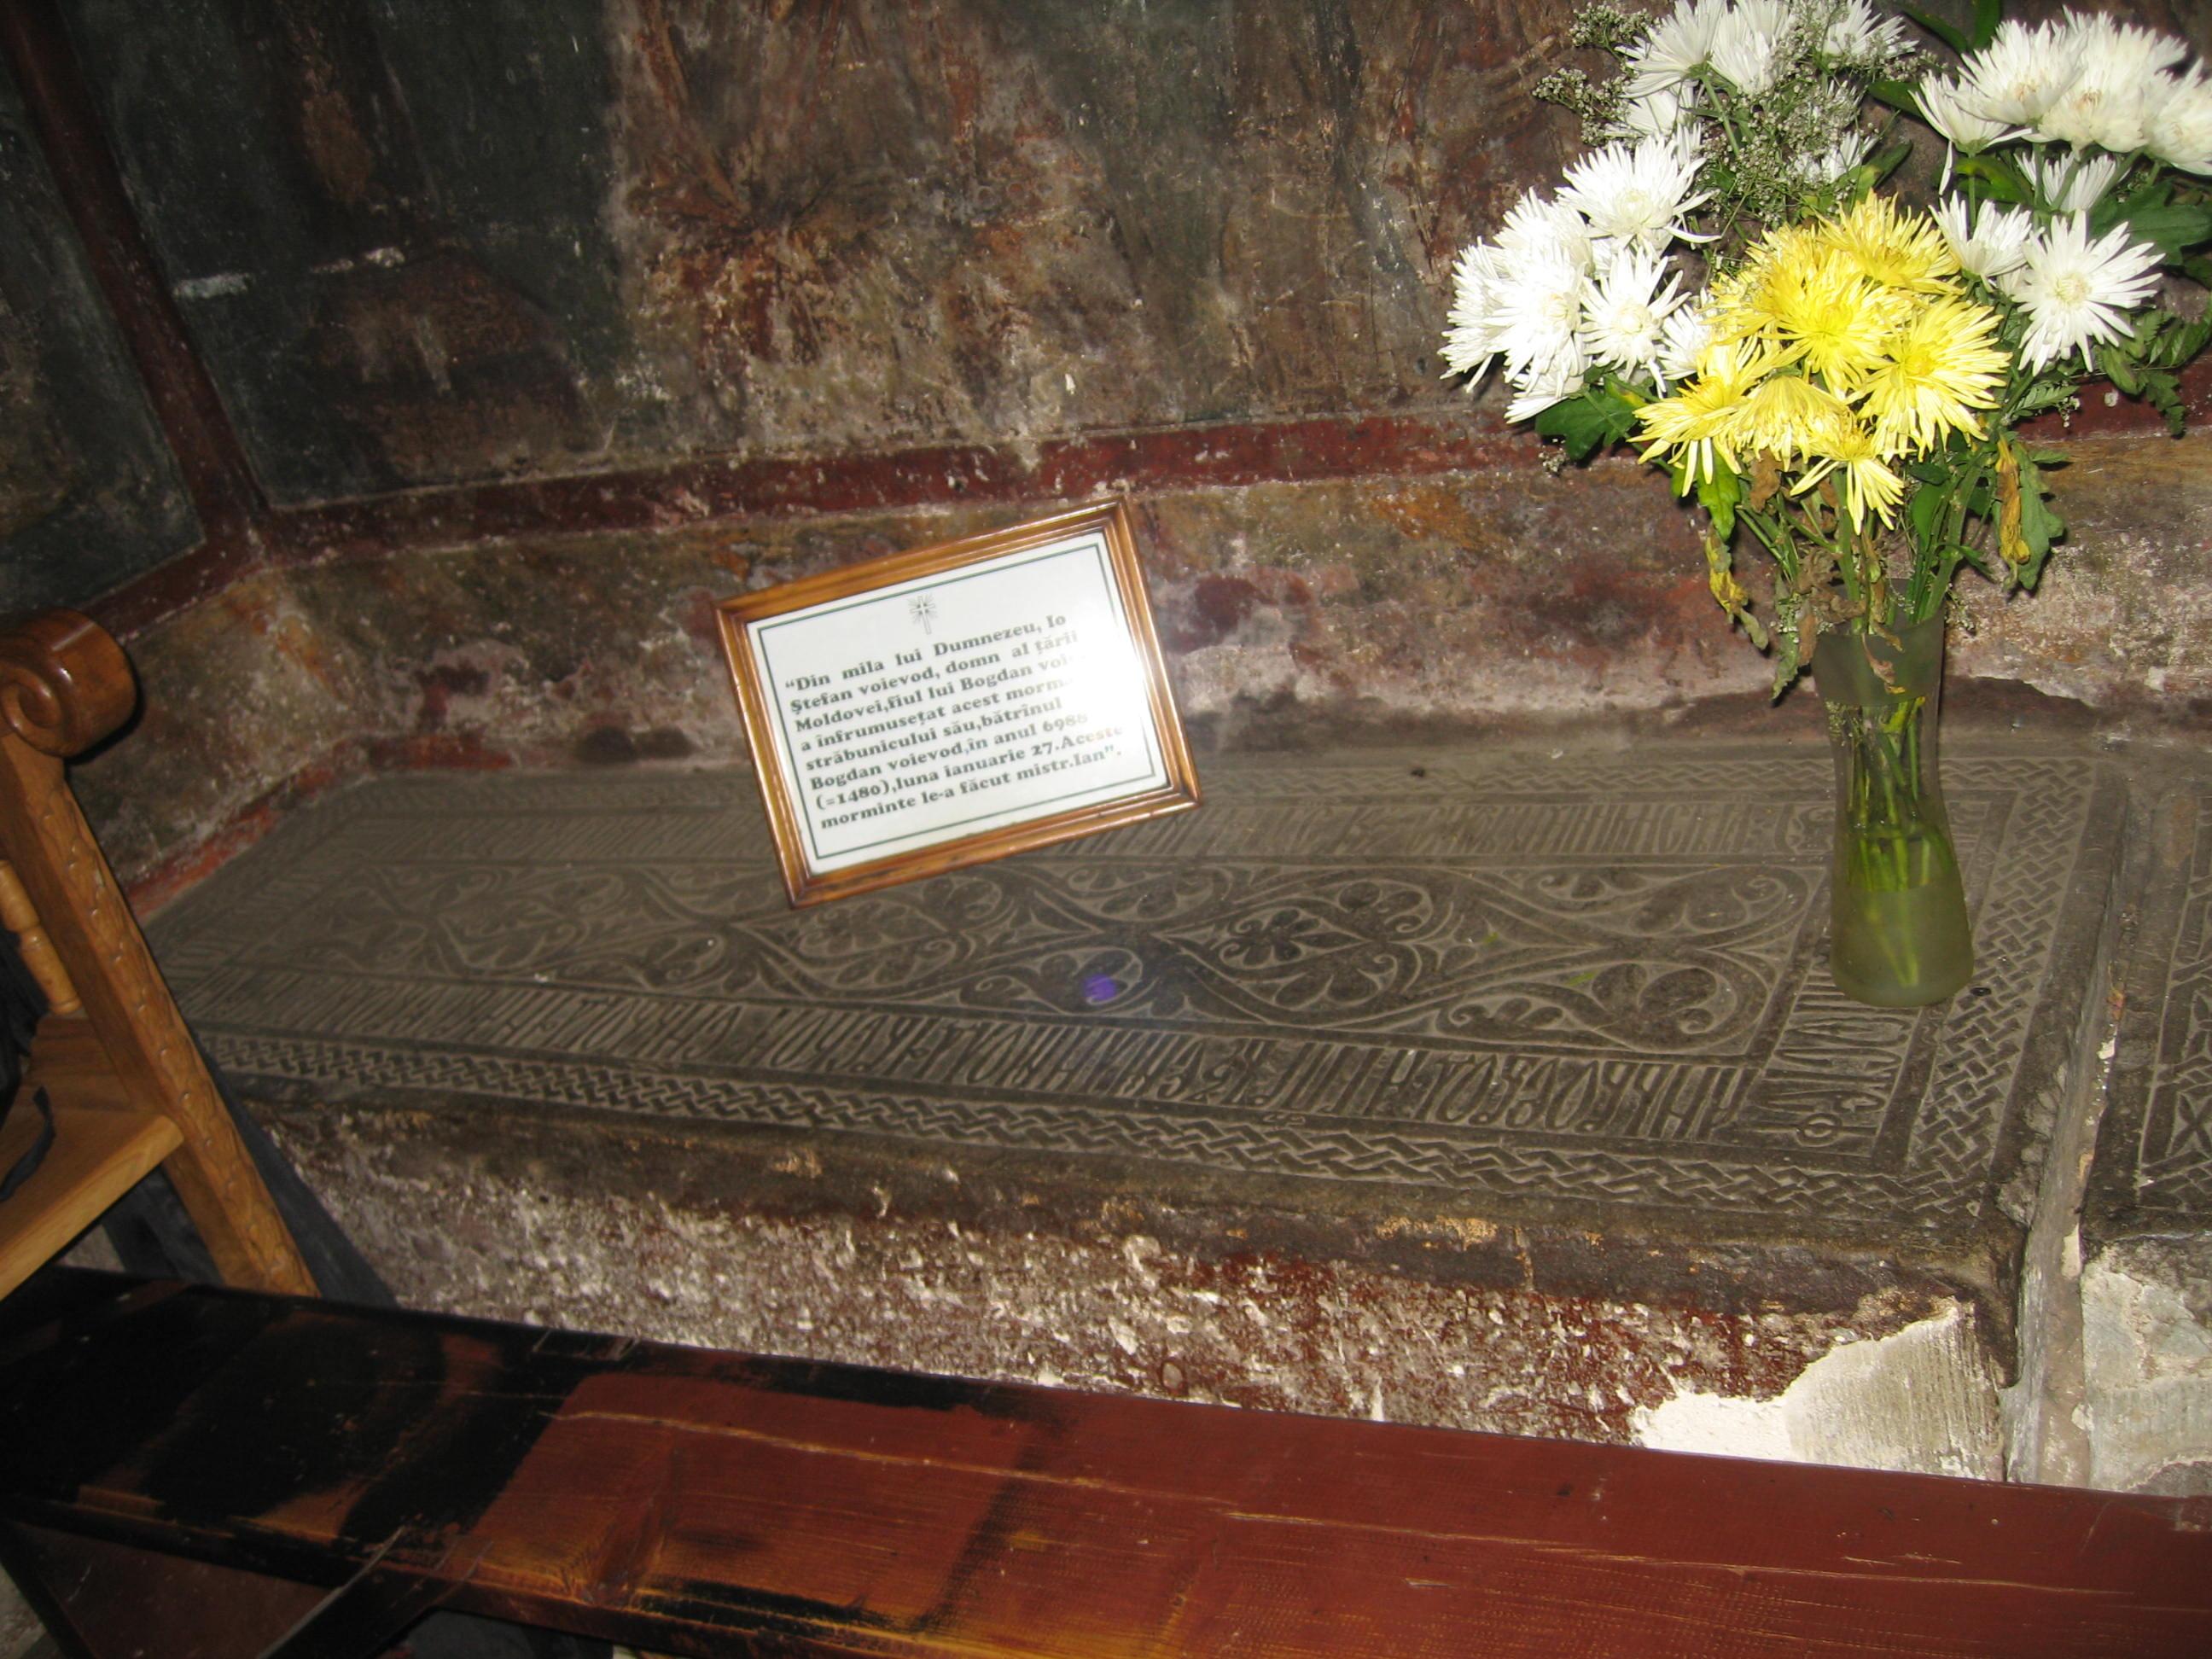 Fişier:Mănăstirea Bogdana7.jpg